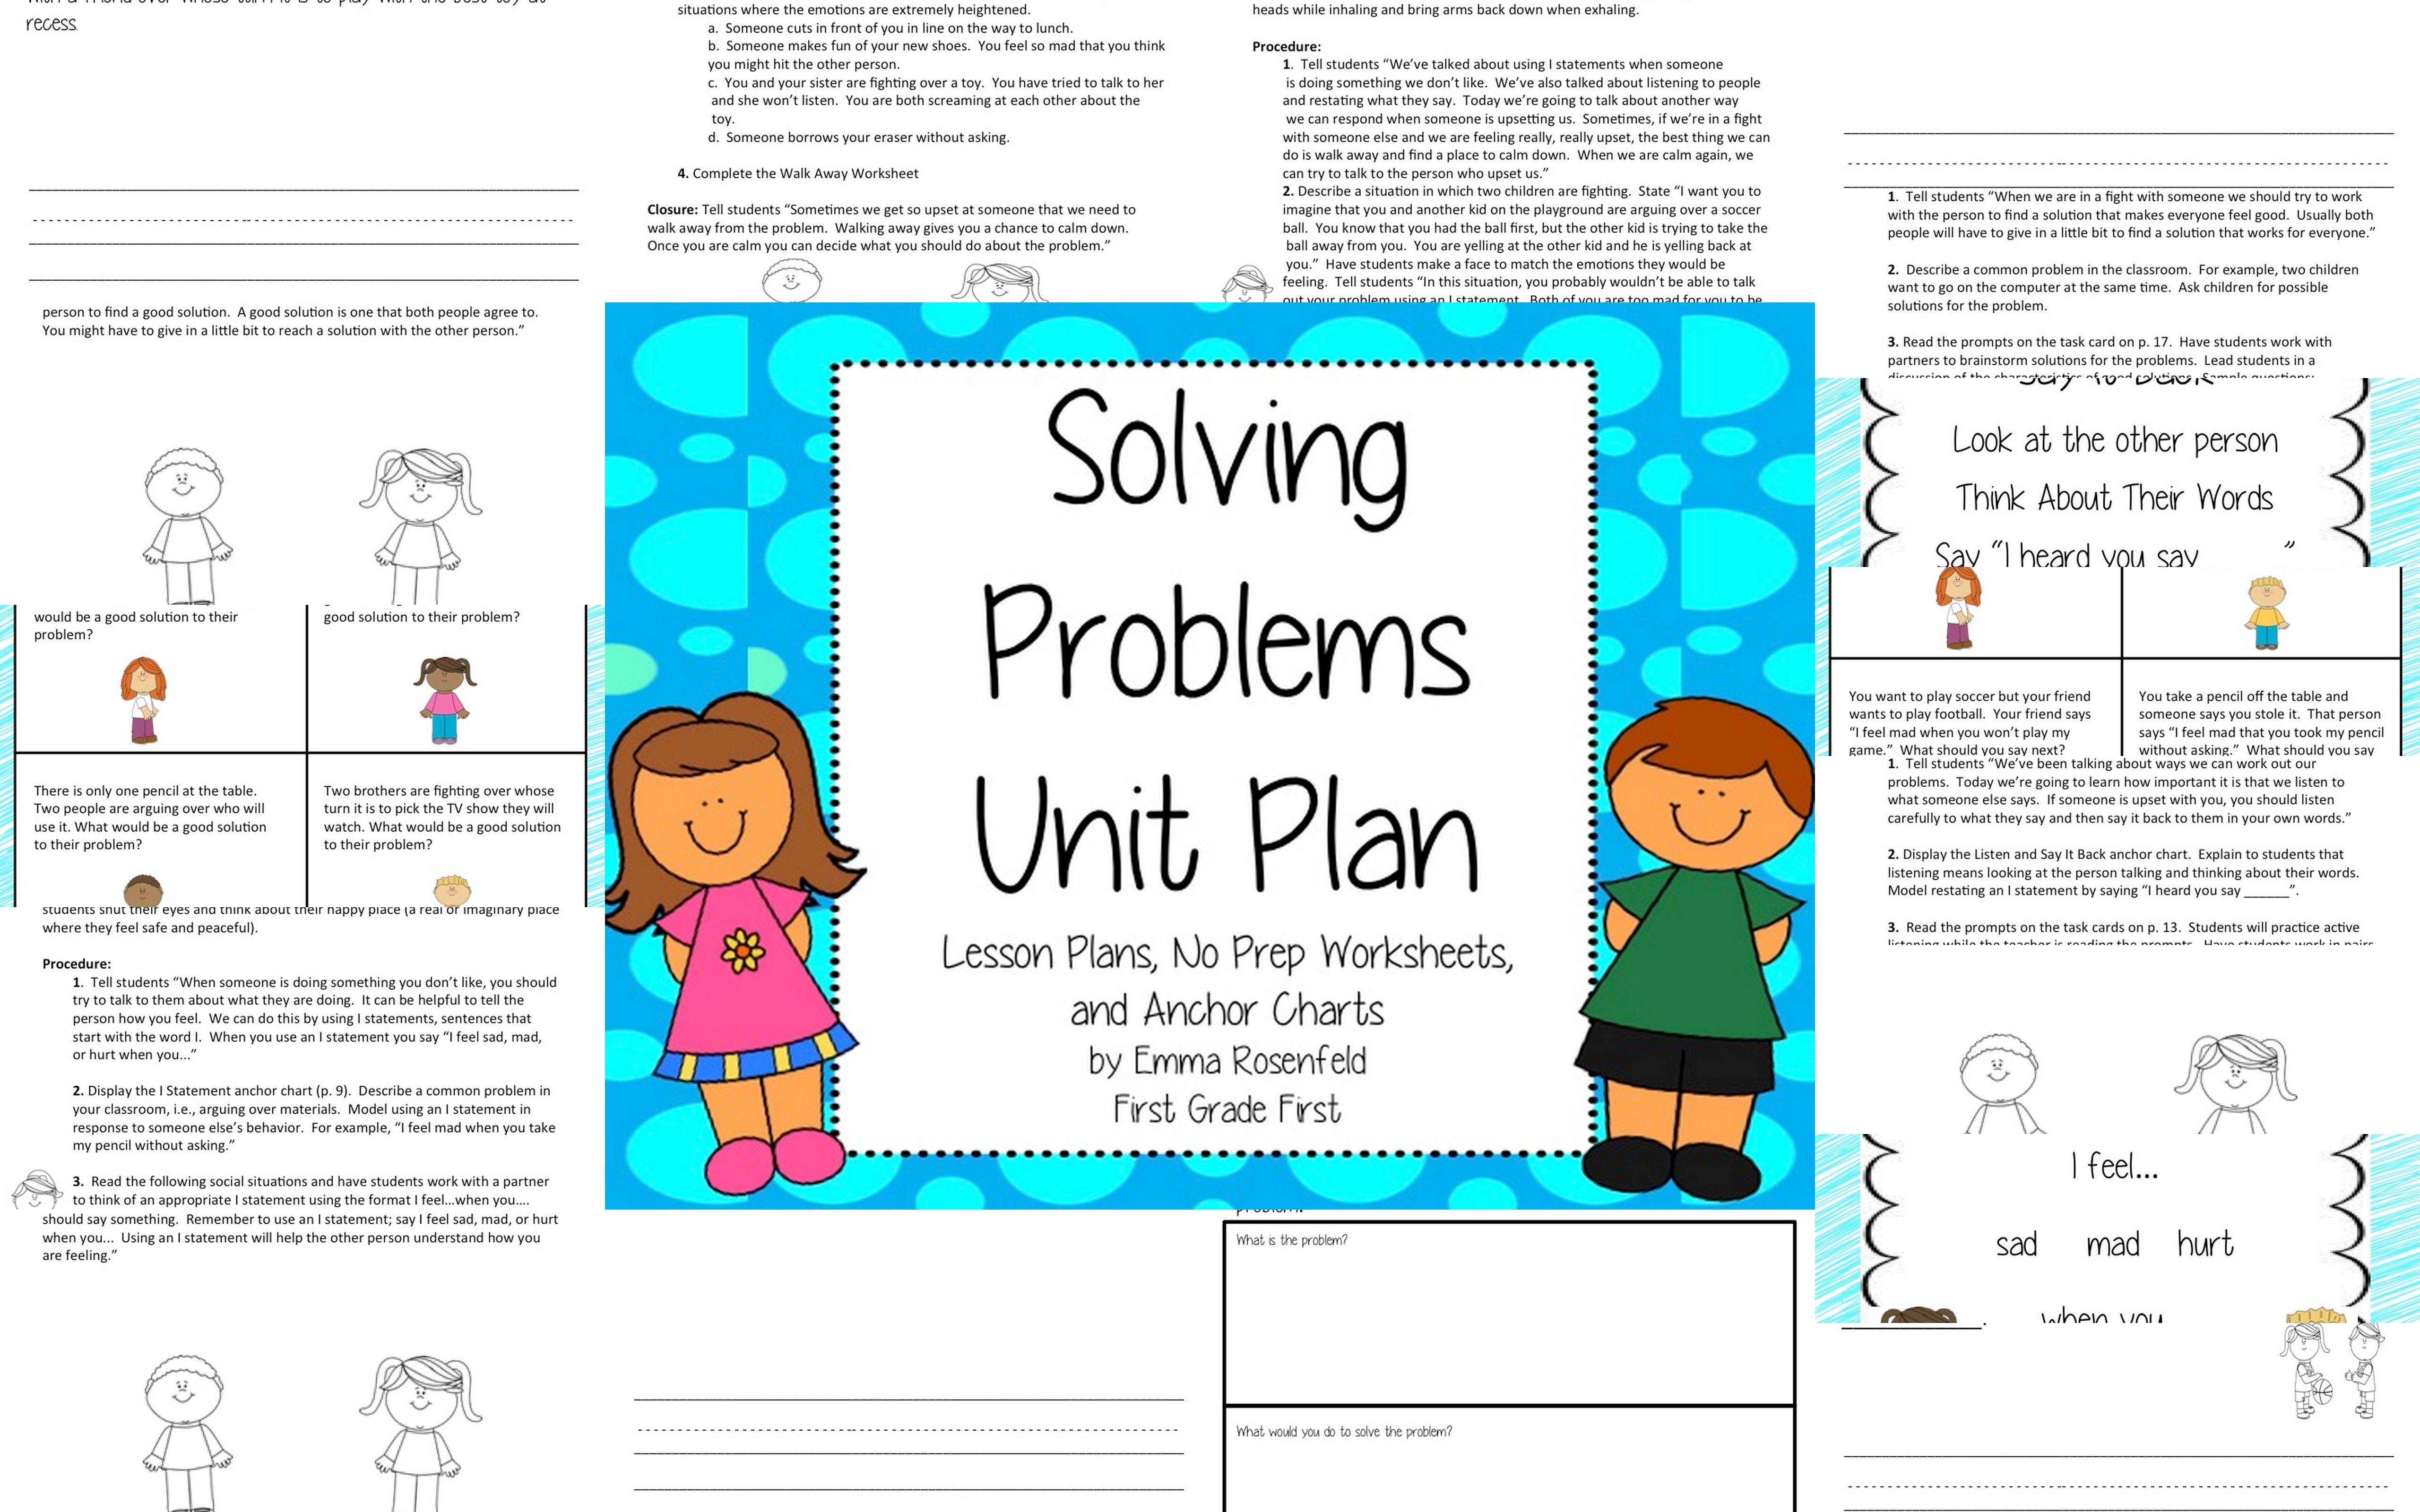 Unit Plan To Teach Primary Kids Problem Solving Strategies